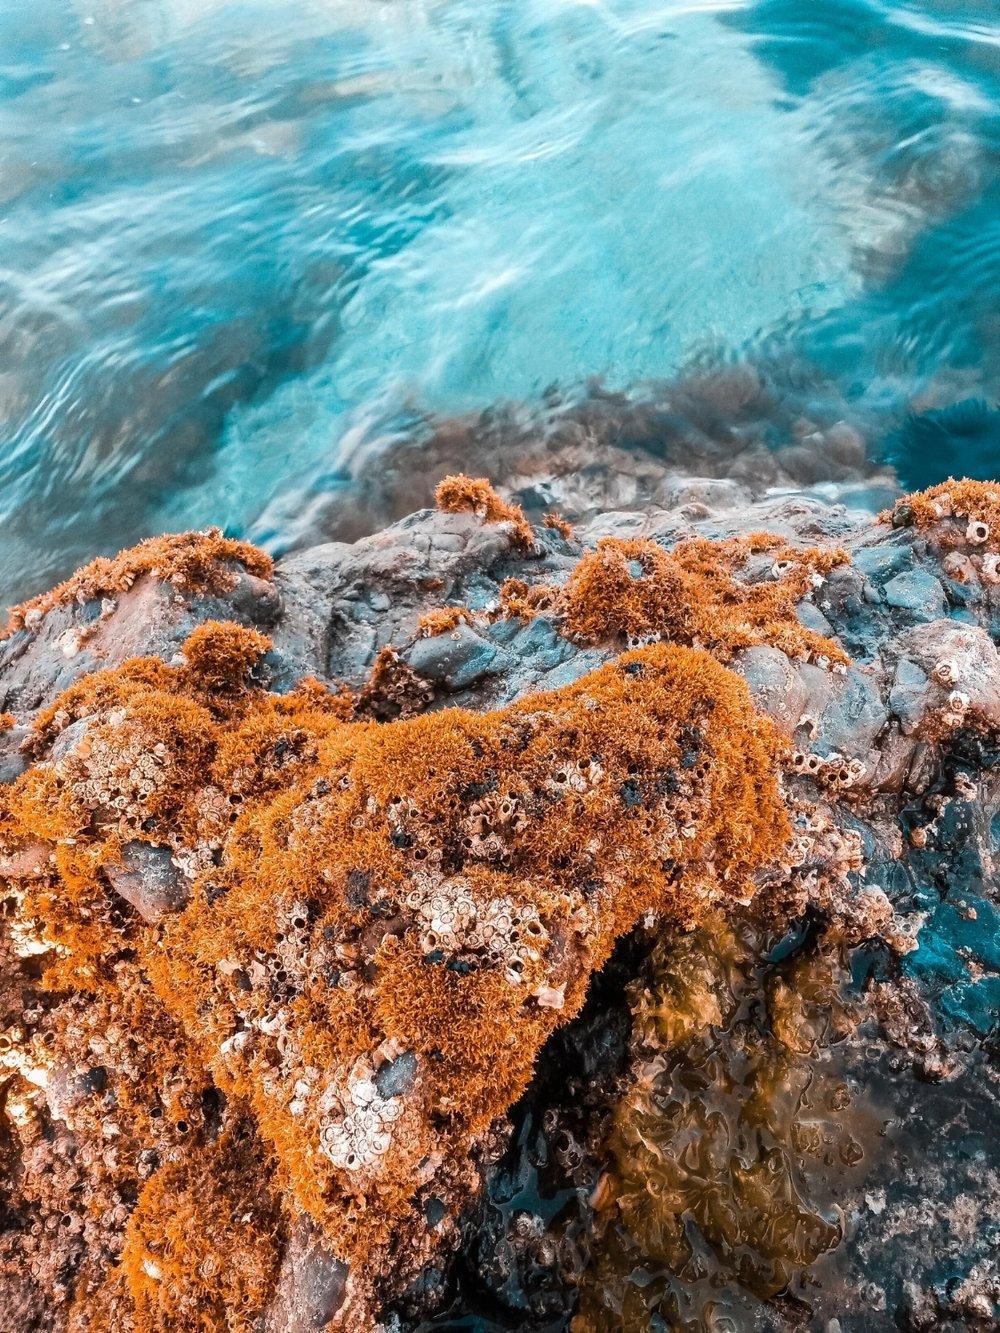 algae-color-marine-1281670.jpg